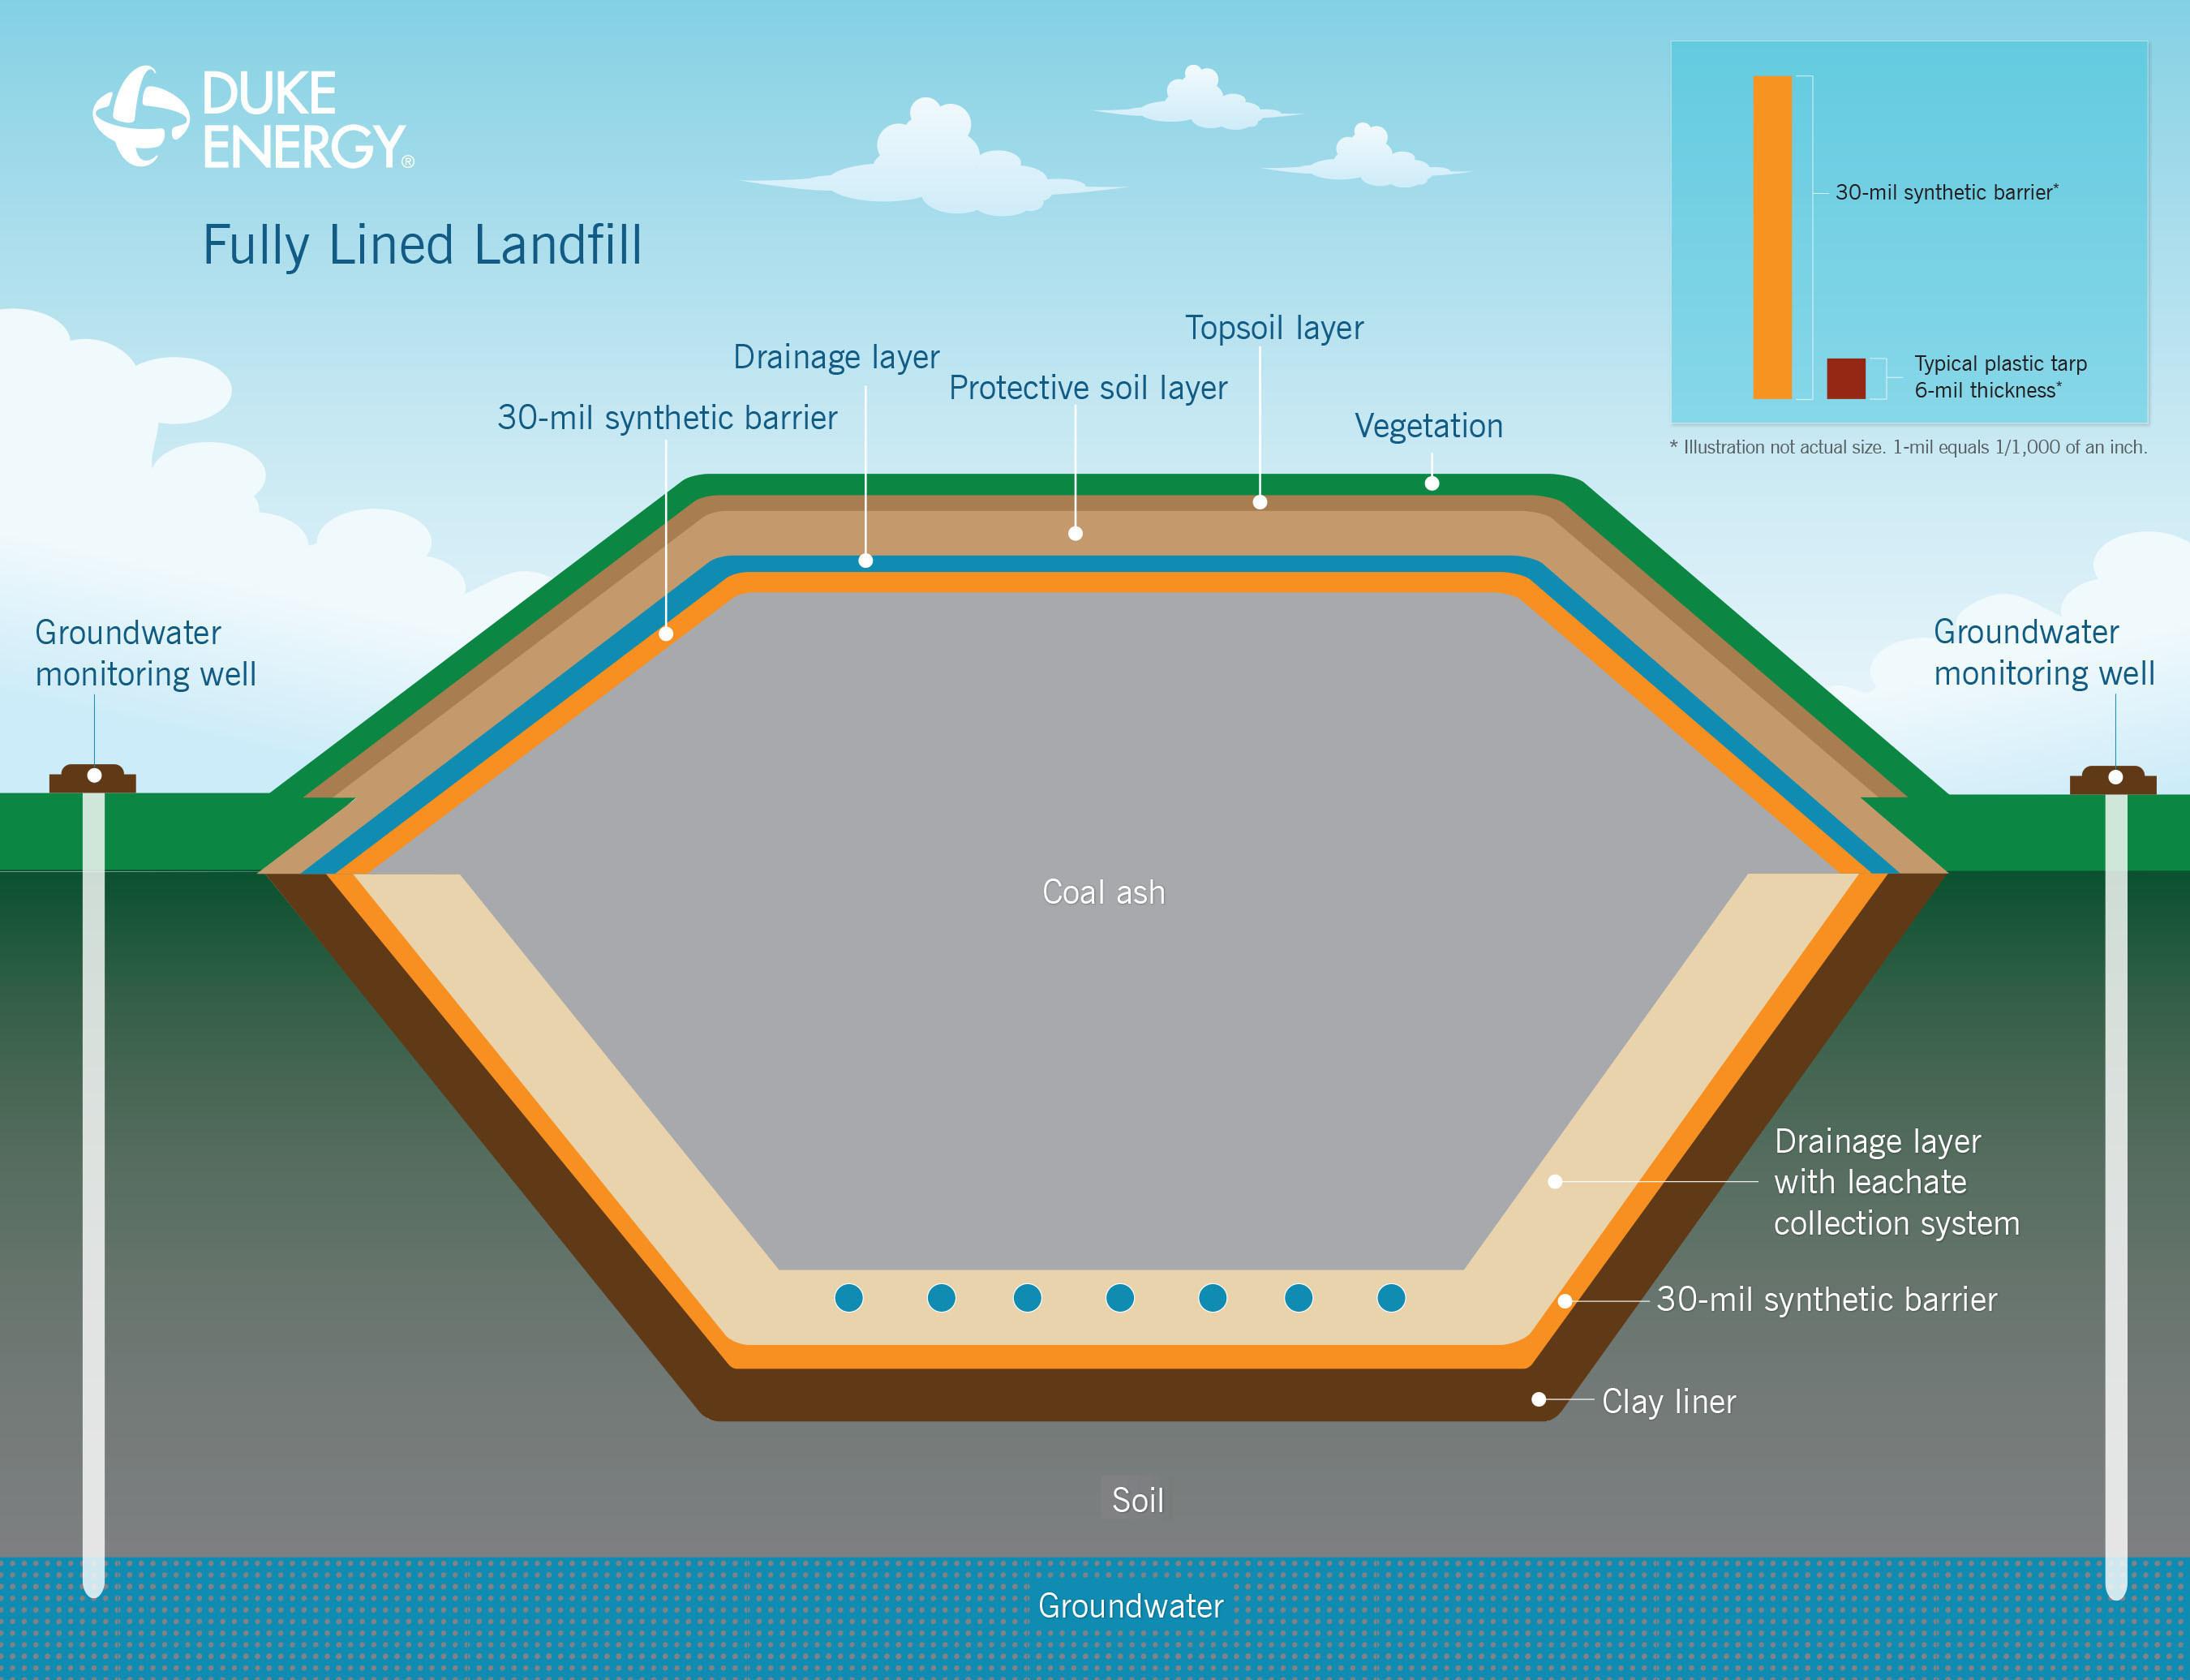 Fully lined coal ash landfill